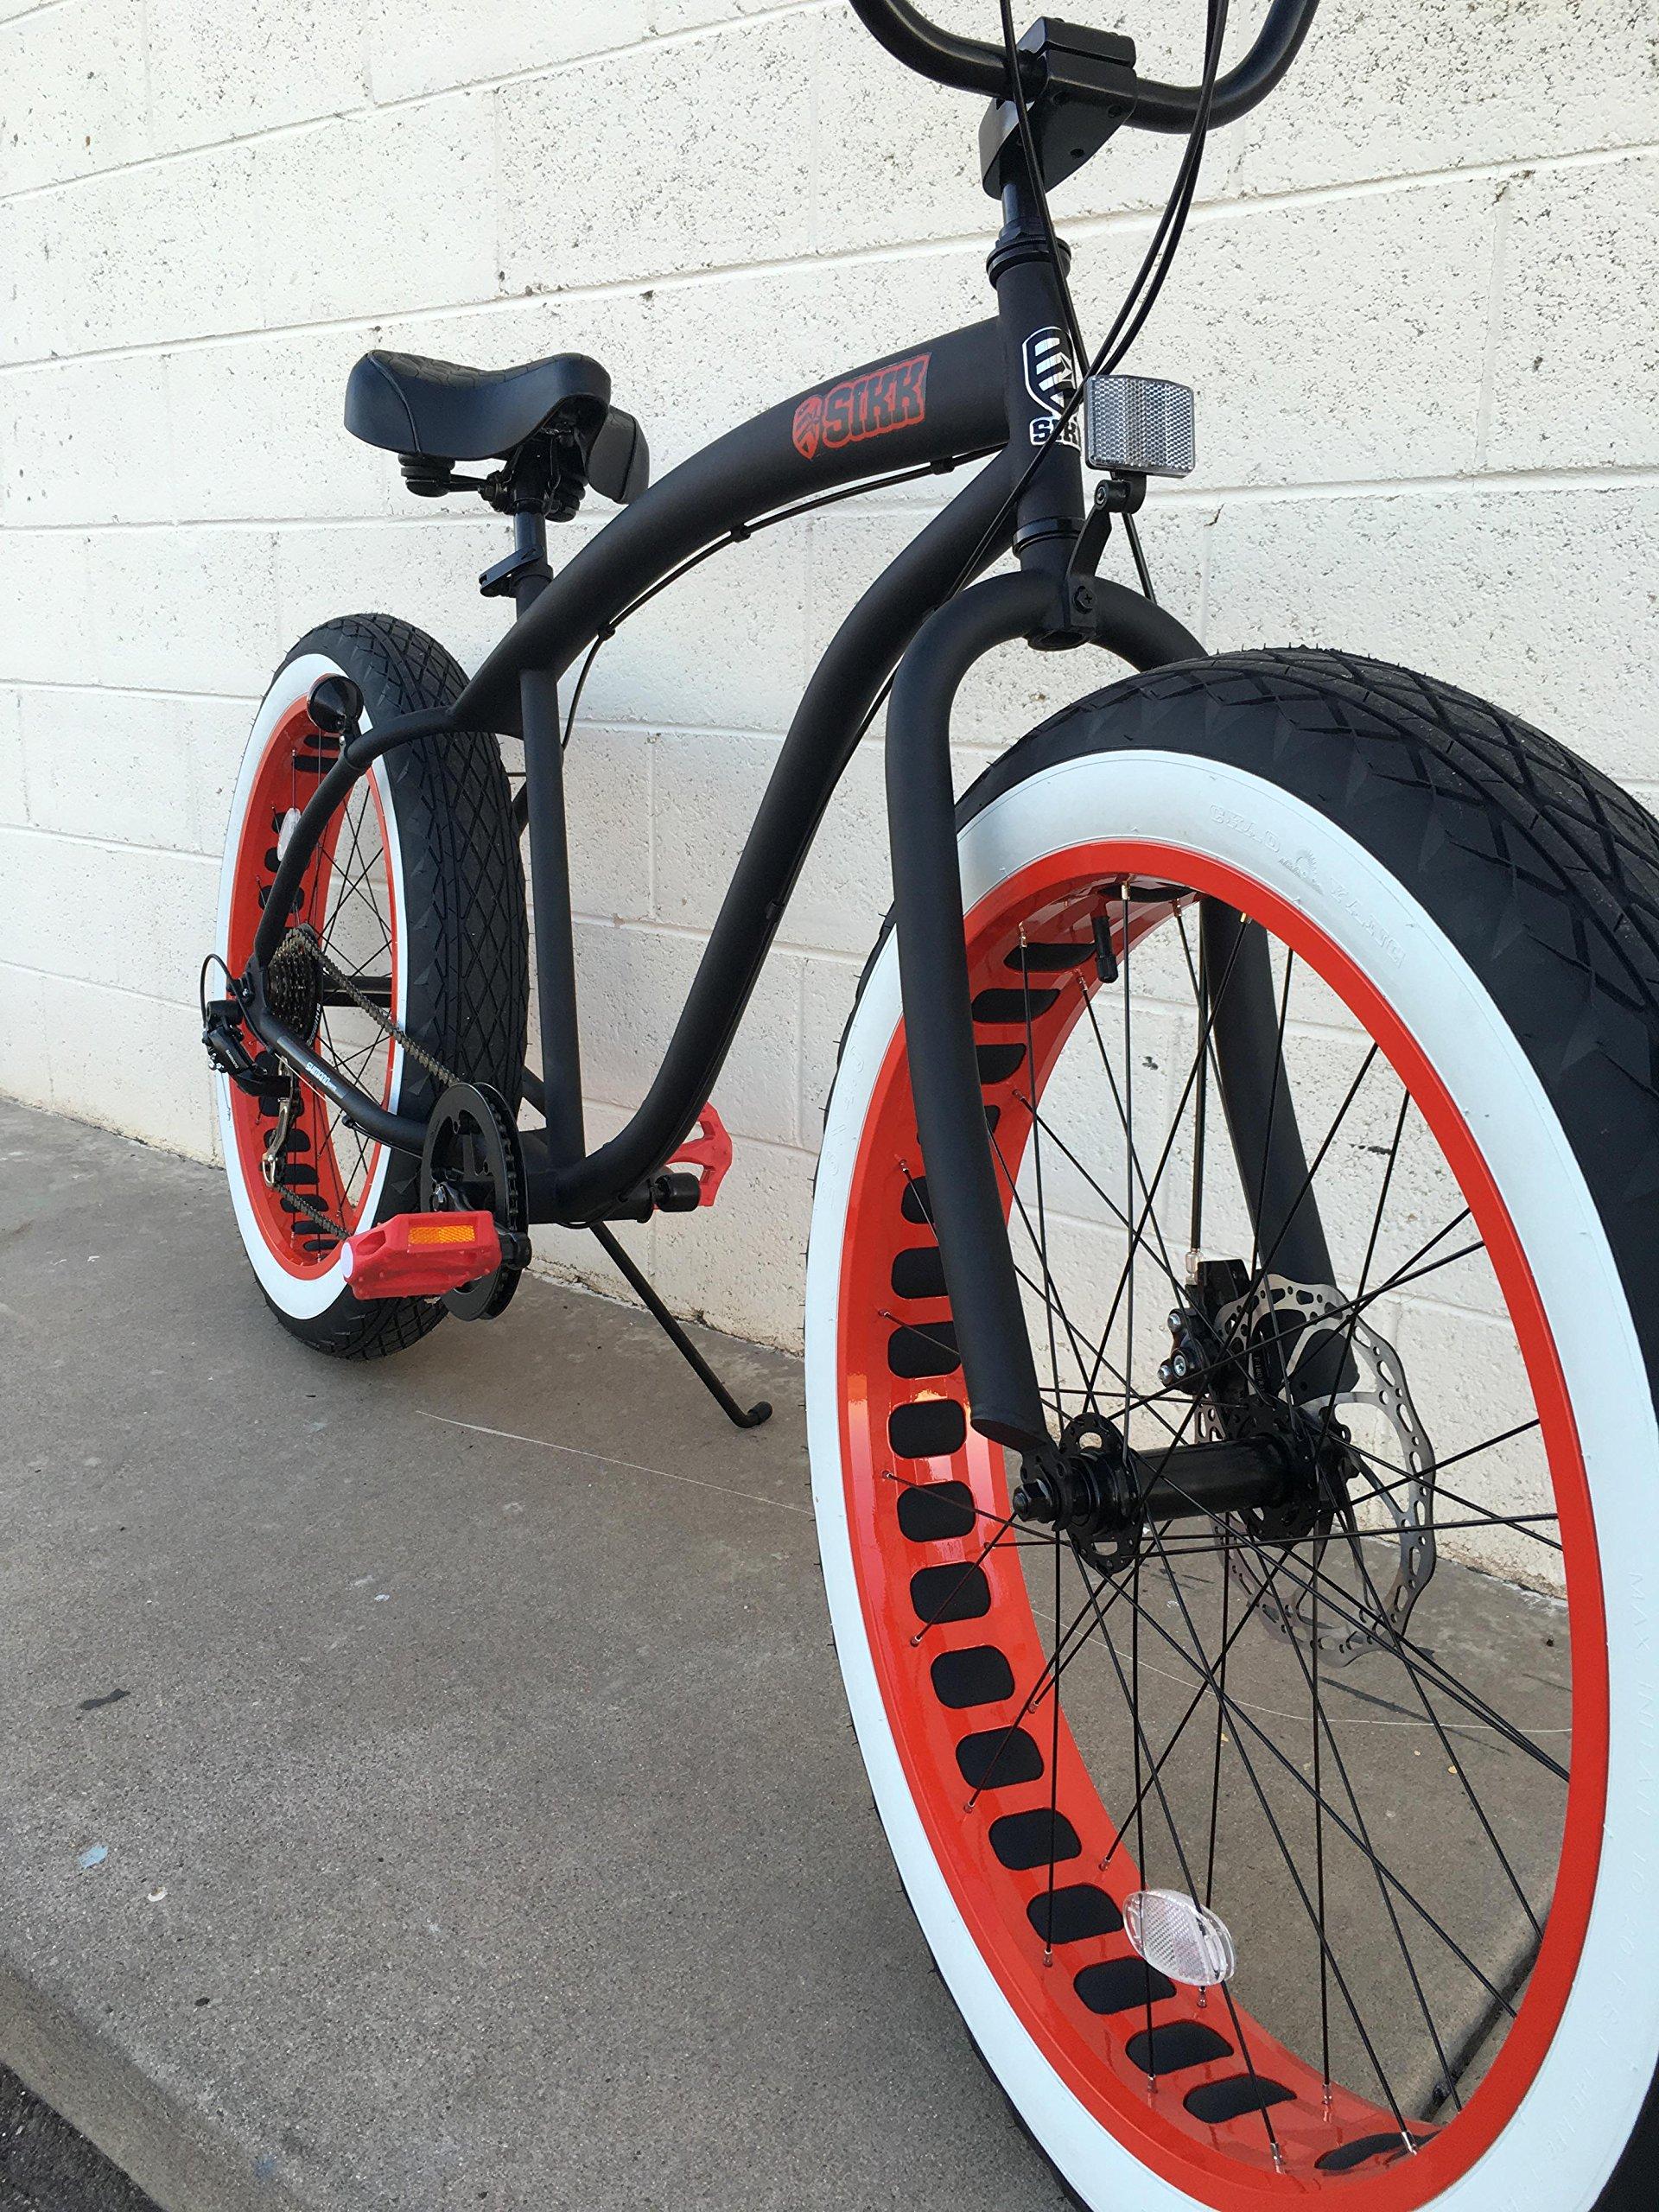 Sikk Fat Tire Beach Cruiser Bicycle 7 Speed Flat Black Red